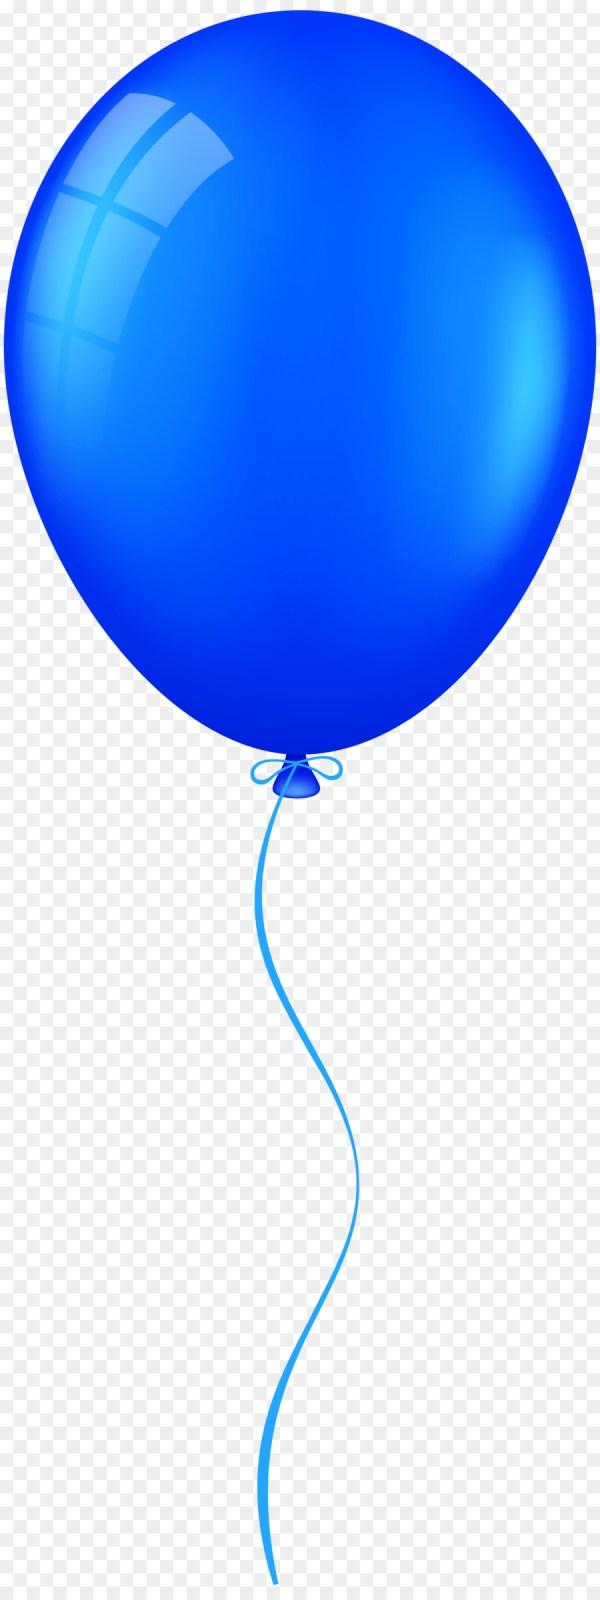 free baloon - yellow glass